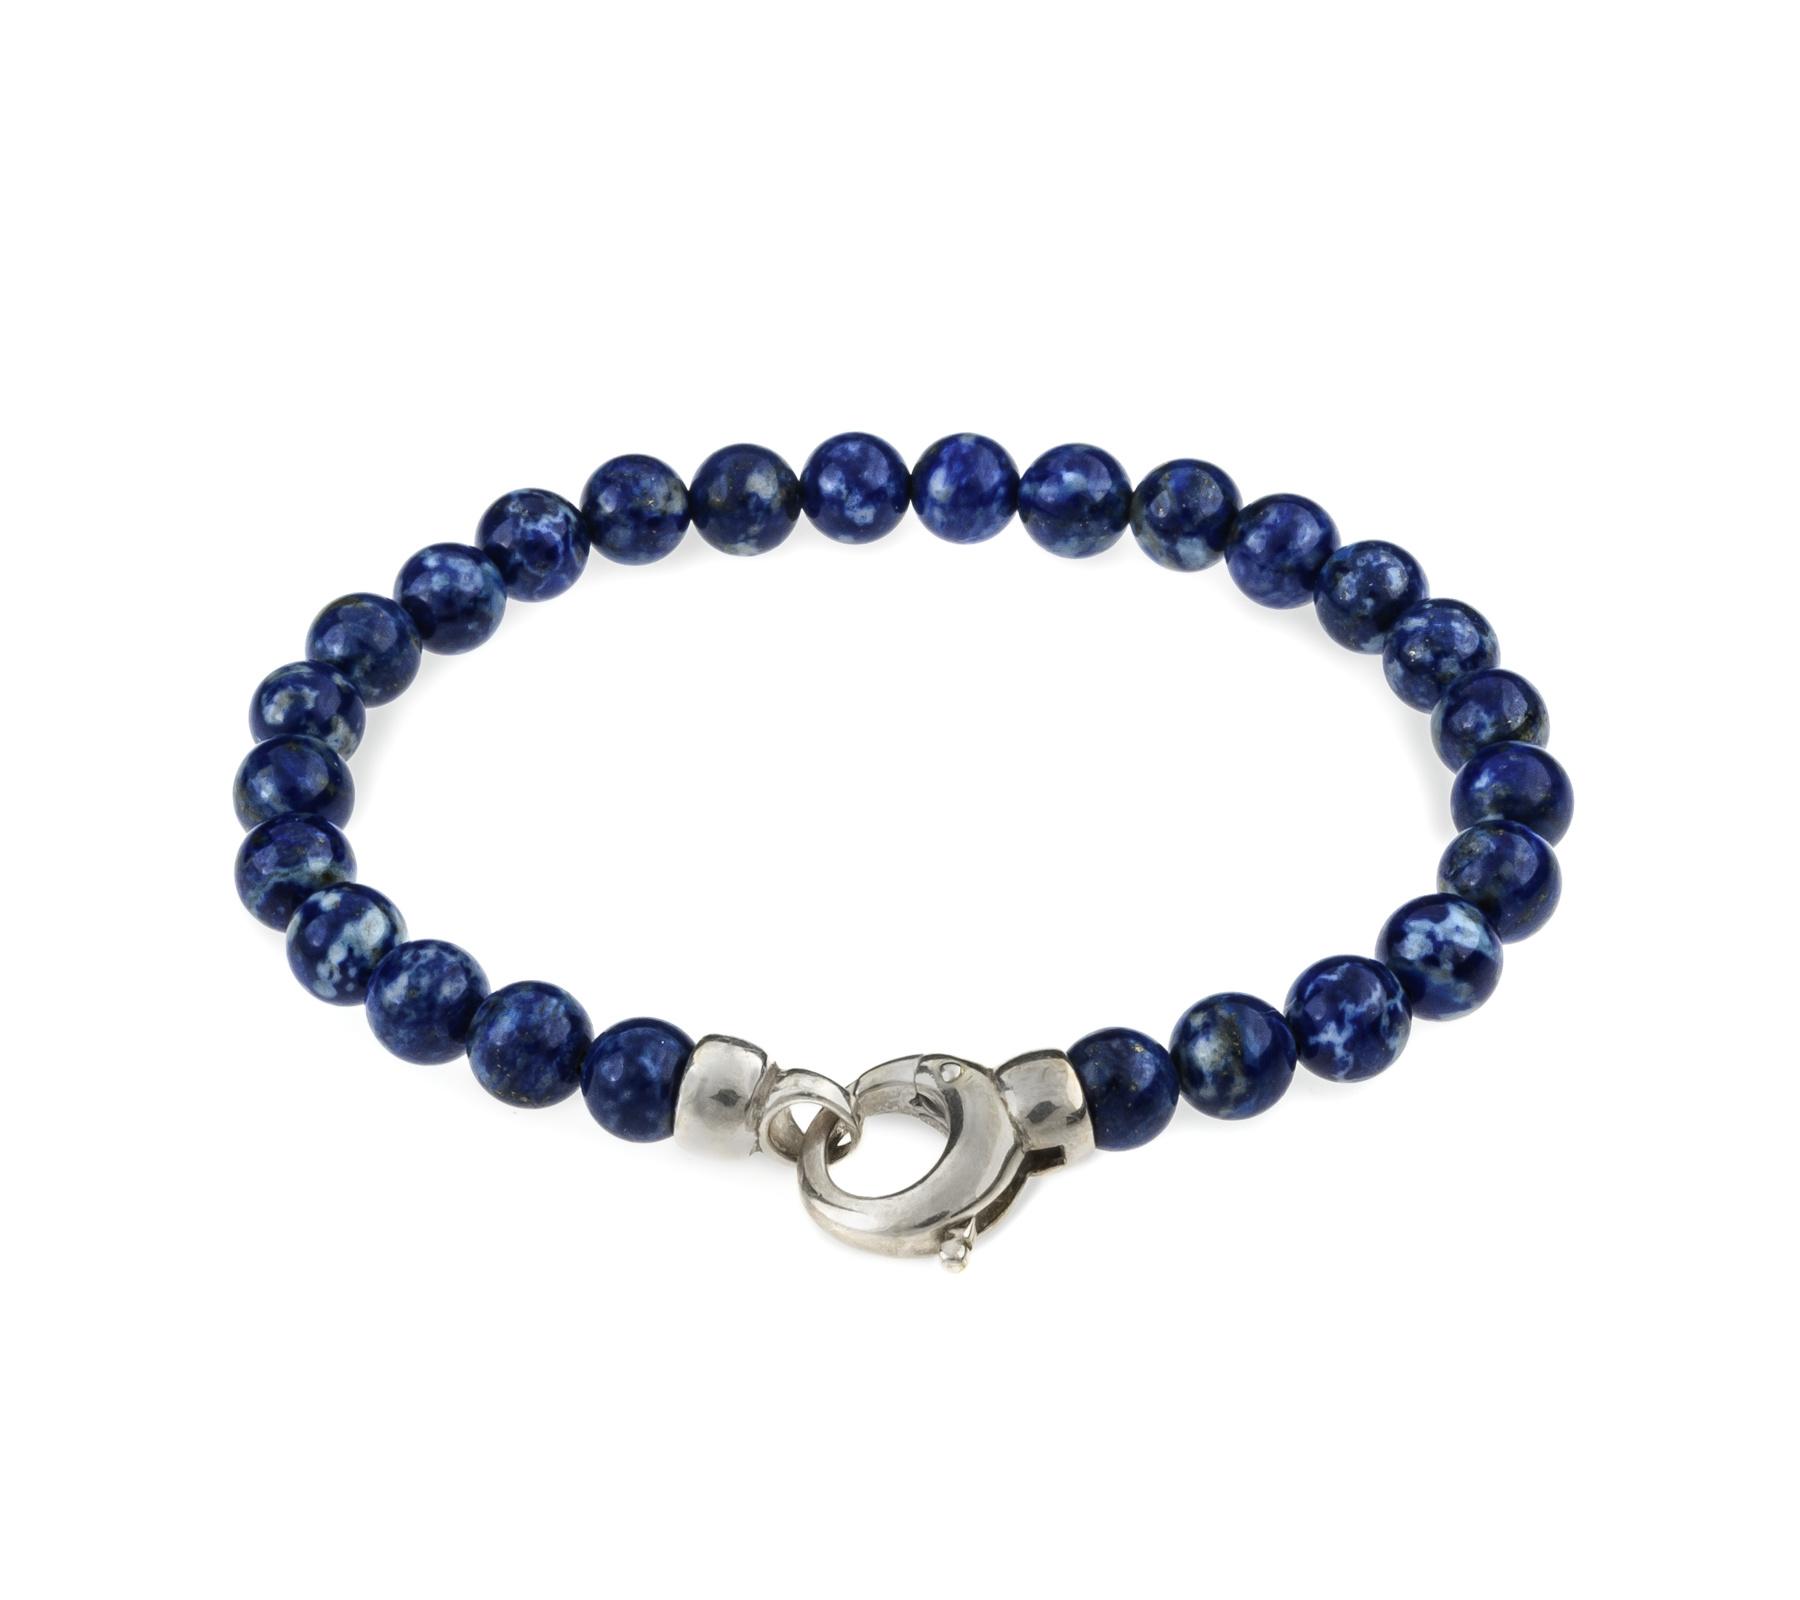 Edelsteen armband lapis lazuli met slot-1